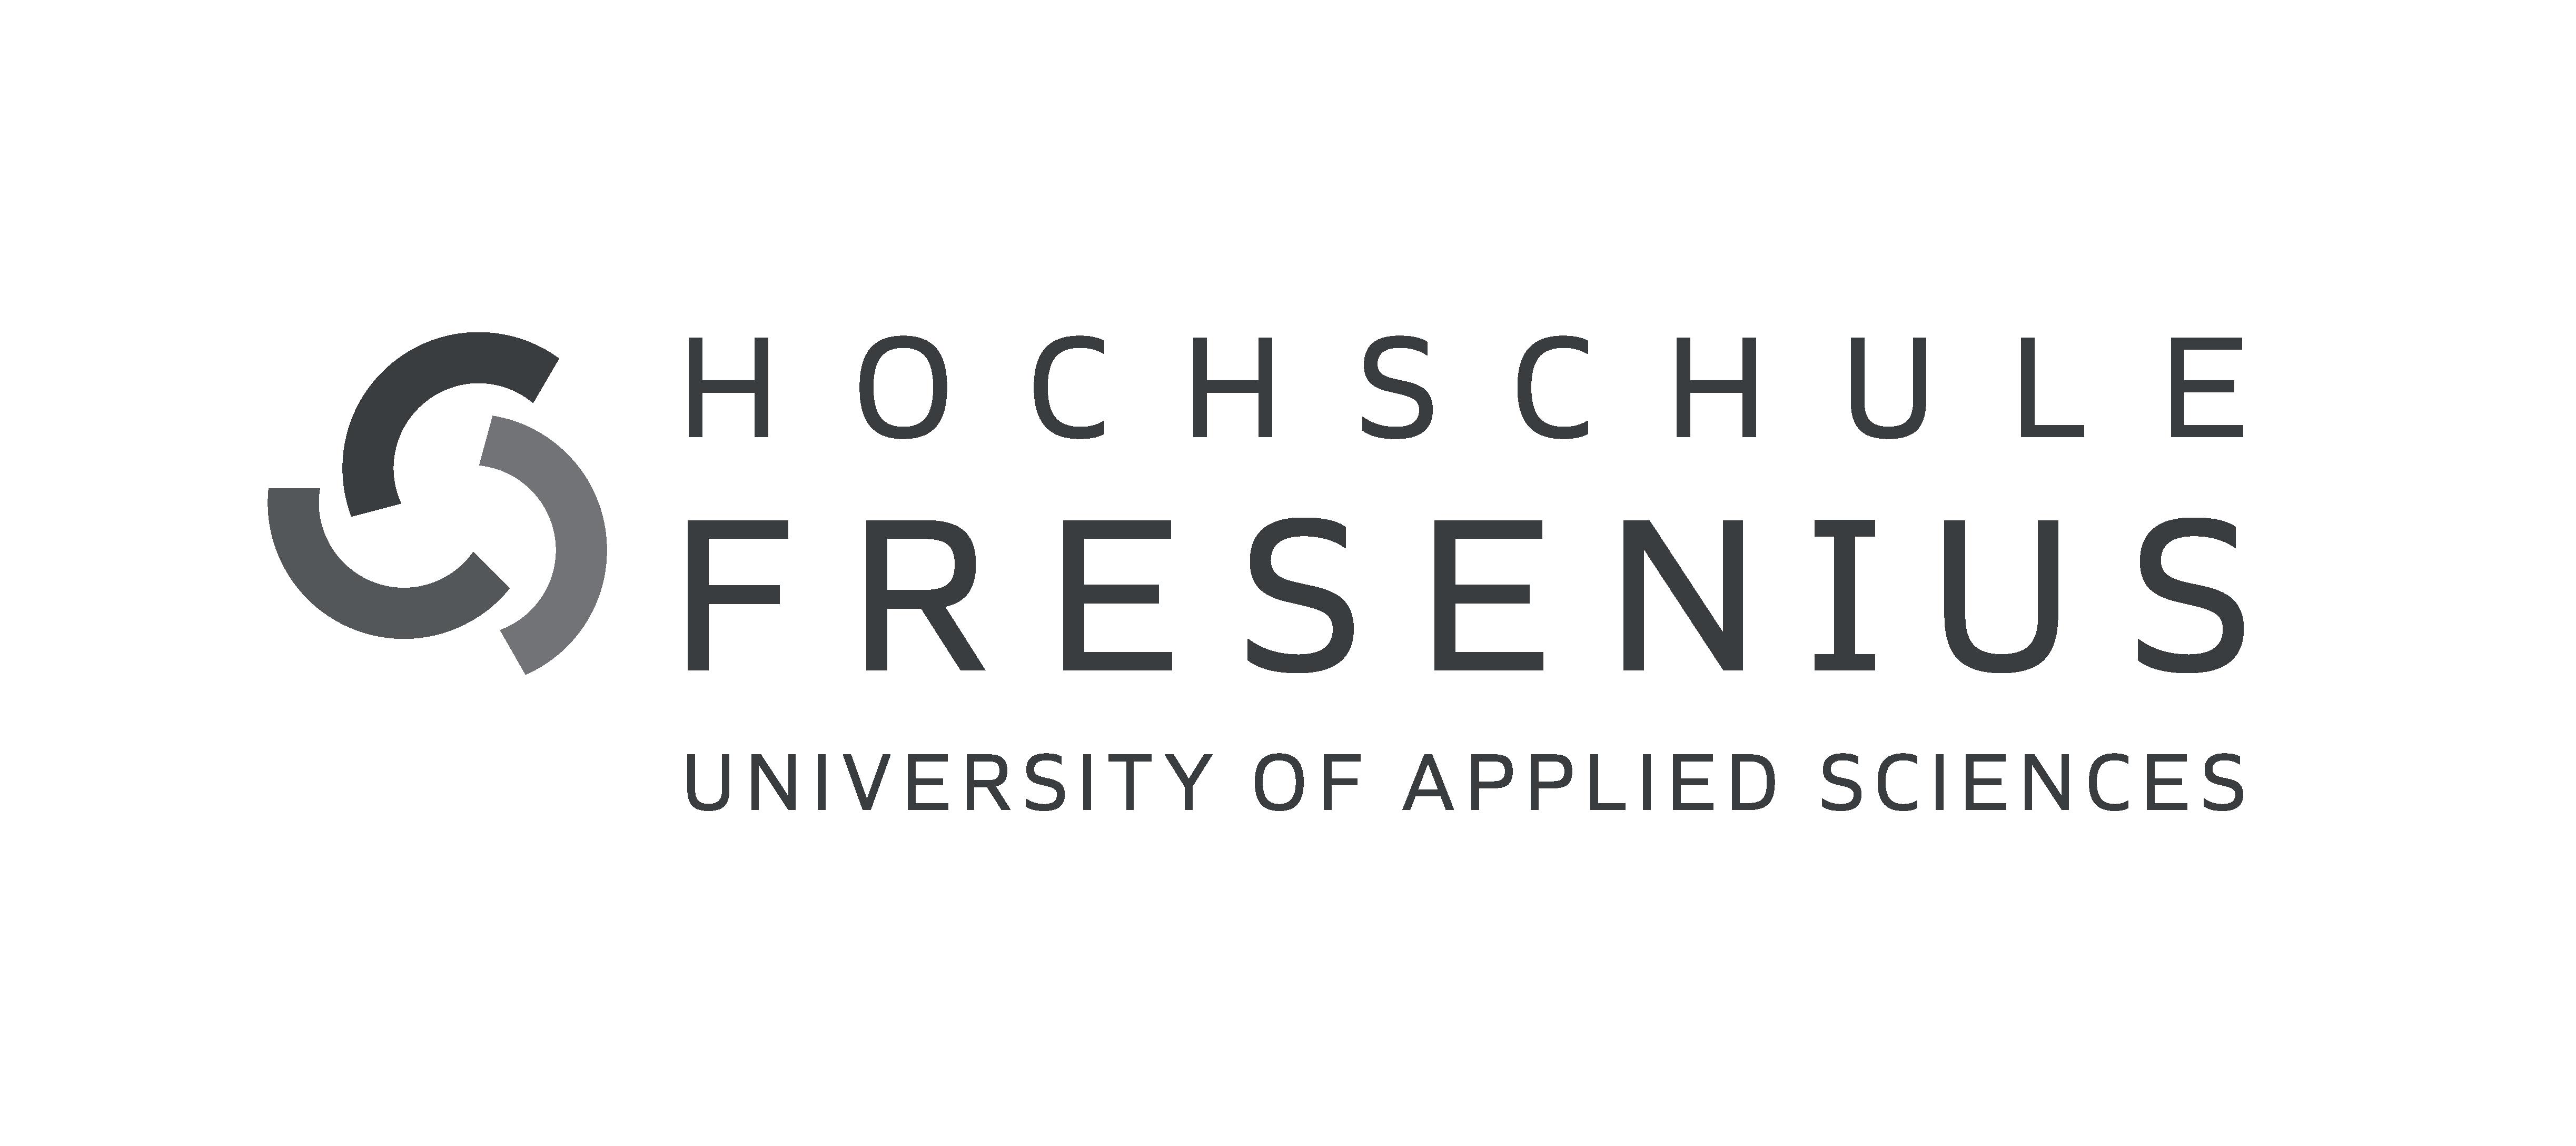 Hochschule Fresenius Logo Google Ads Academy